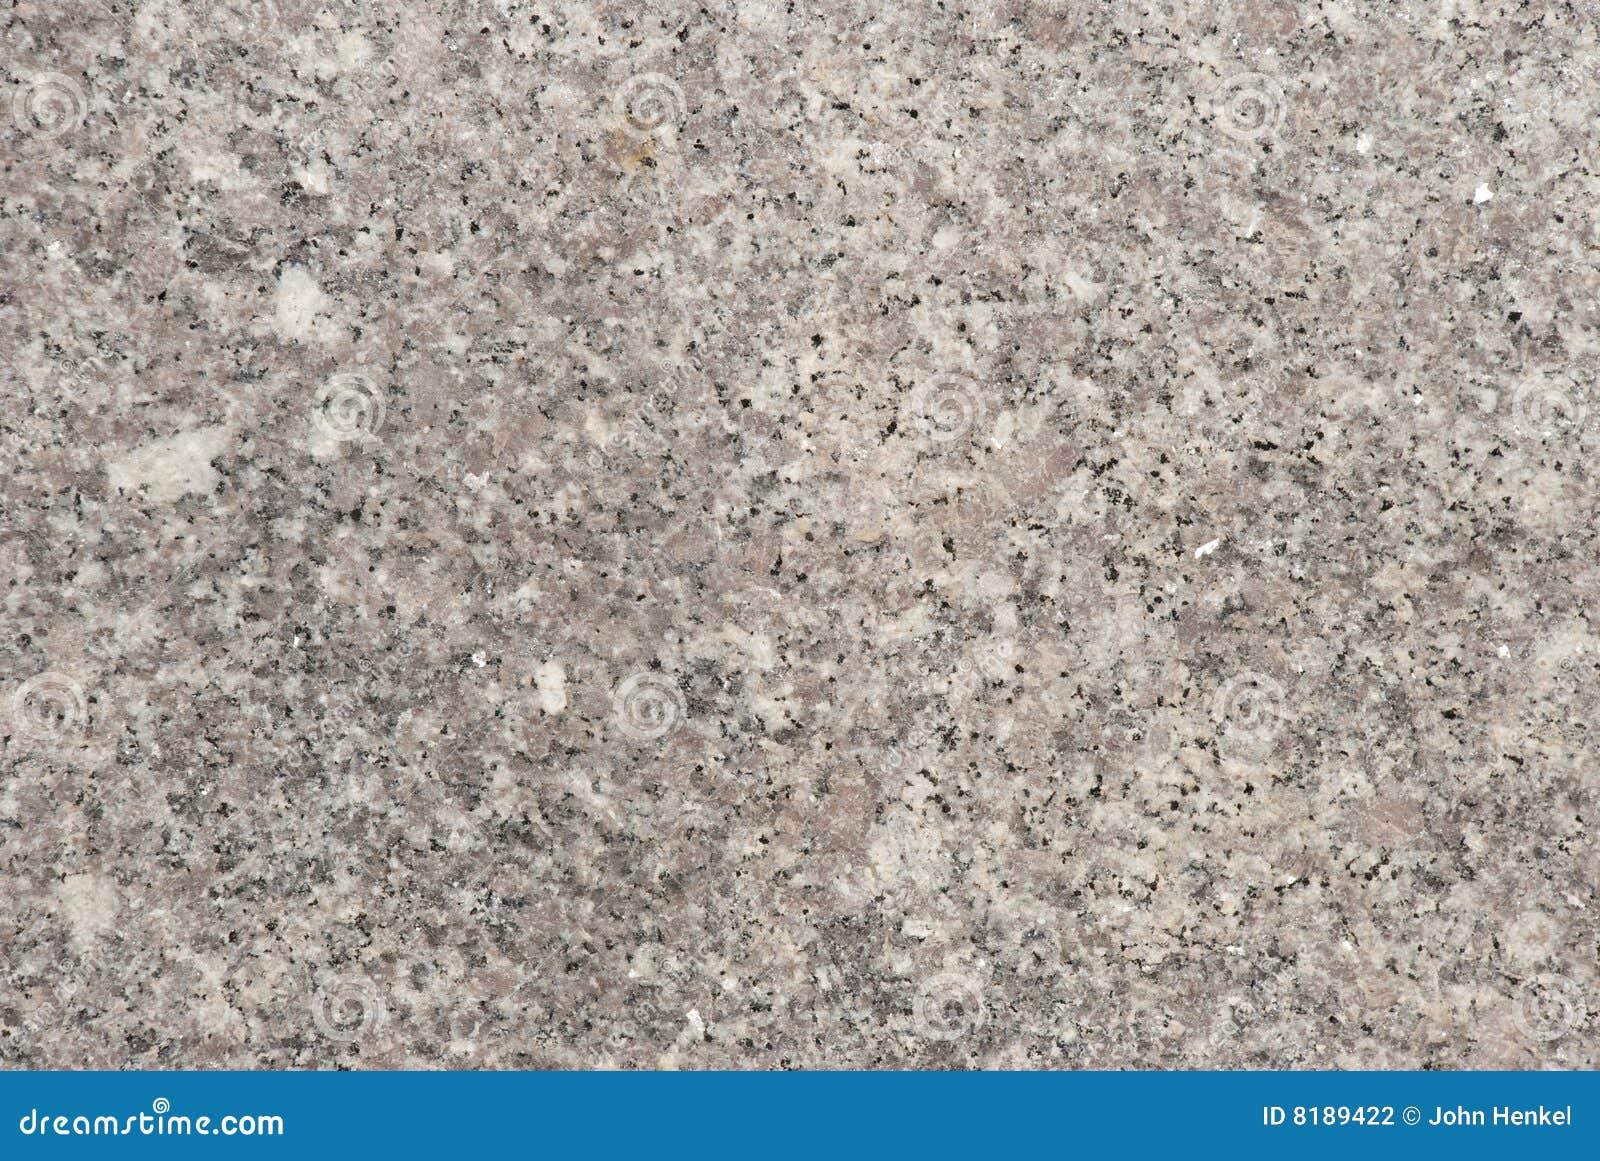 Stone Granite : Grey Stone Granite Background Stock Photography - Image: 8189422